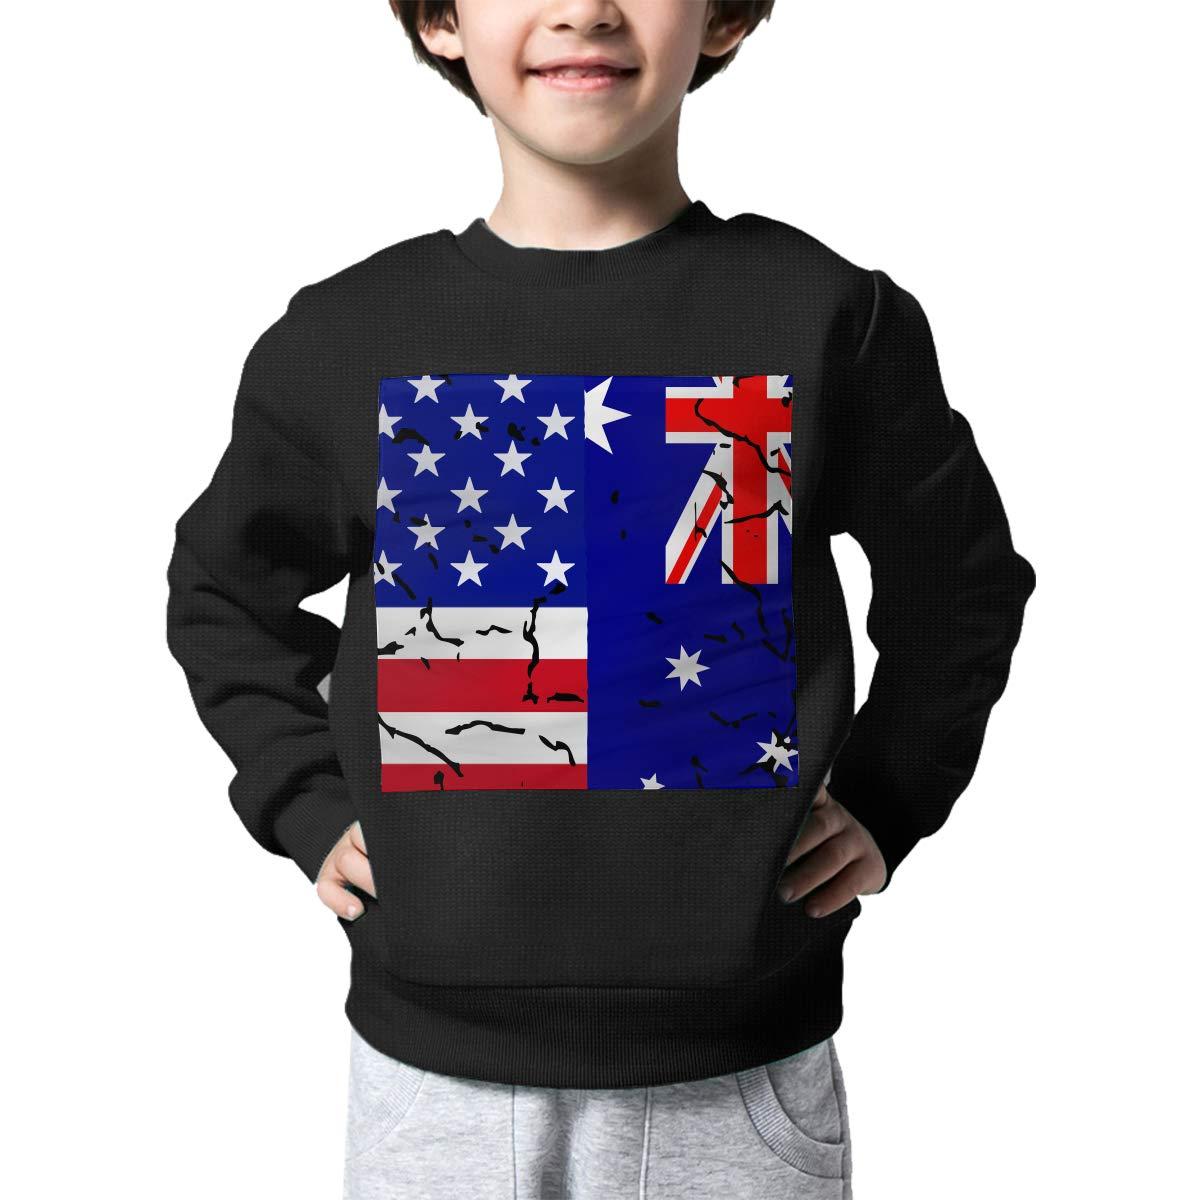 NJKM5MJ Boys Girls USA Australian Flag Lovely Sweaters Soft Warm Unisex Children Kids Sweater